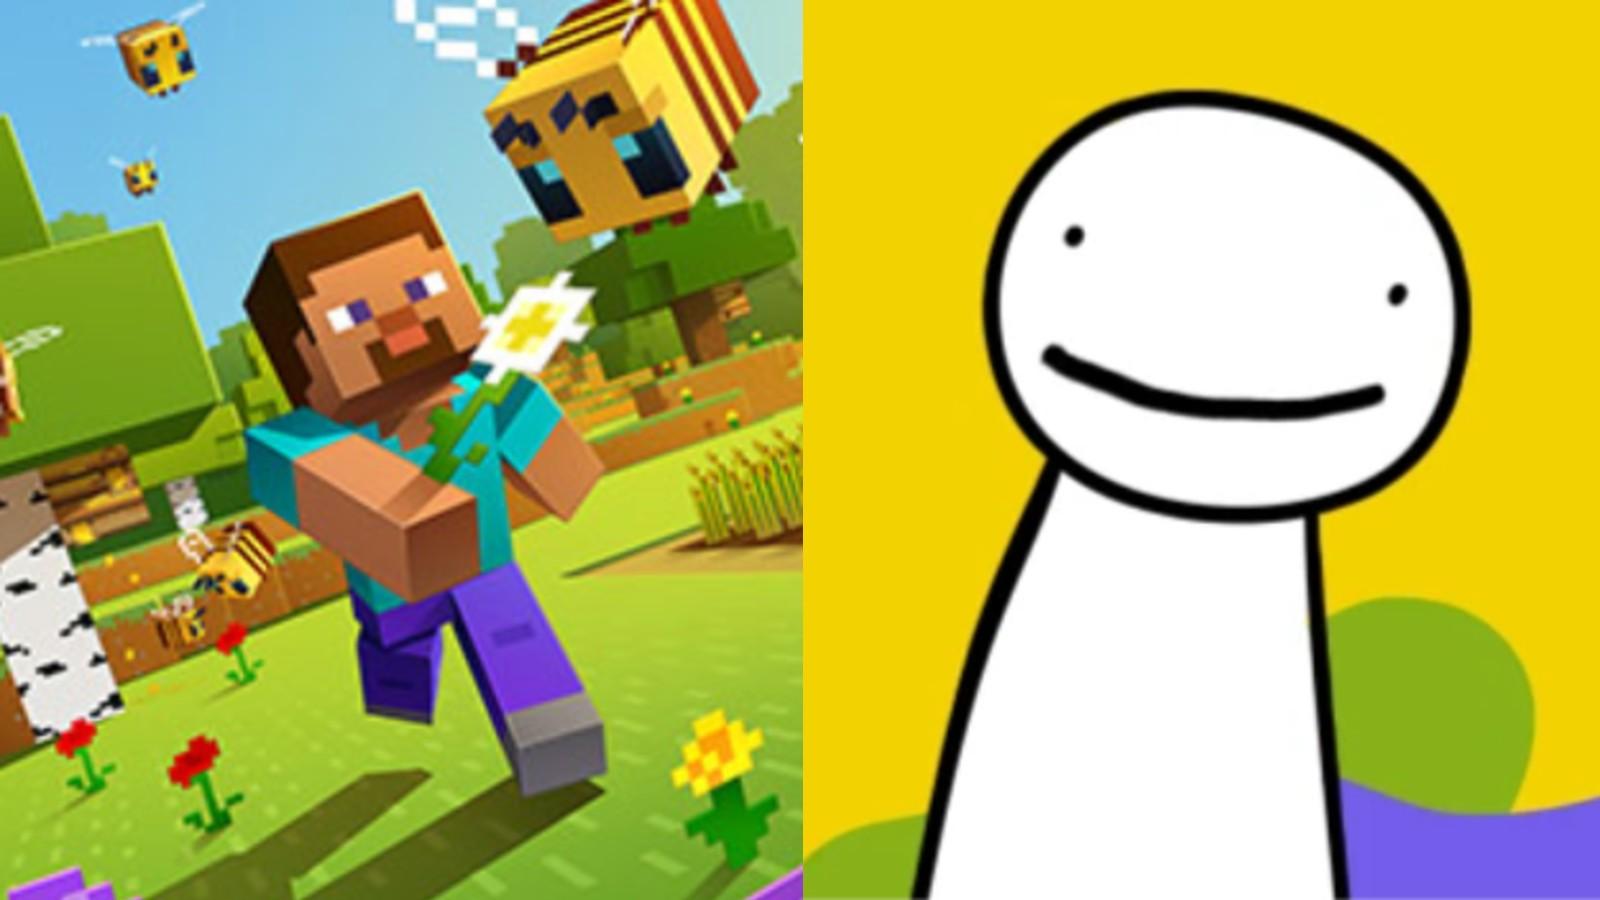 Minecraft promo image next to Dream logo